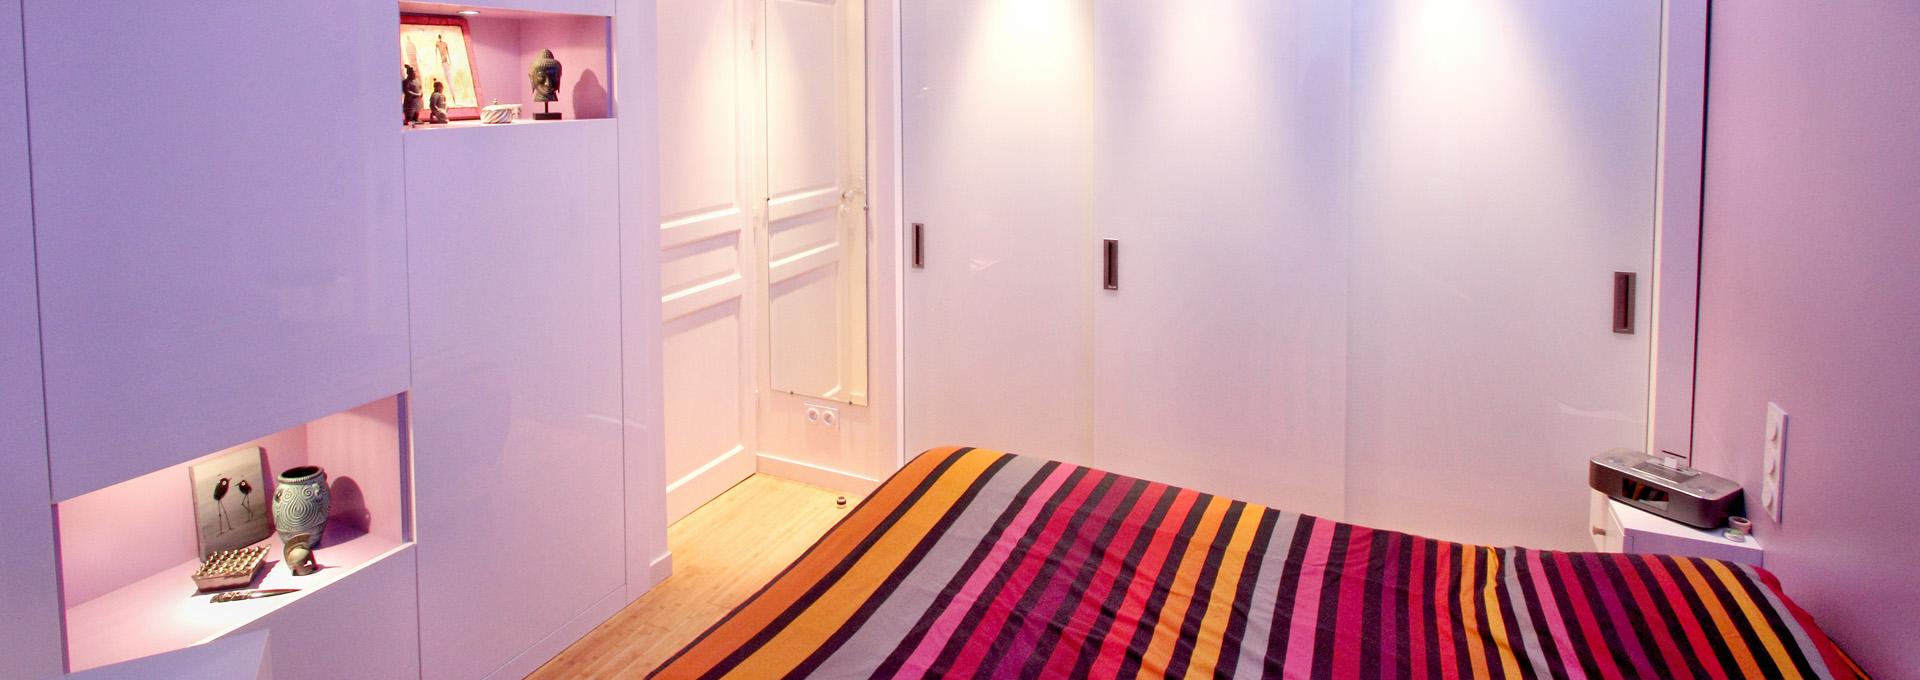 Chambre Luxe Paris – Chaios.com